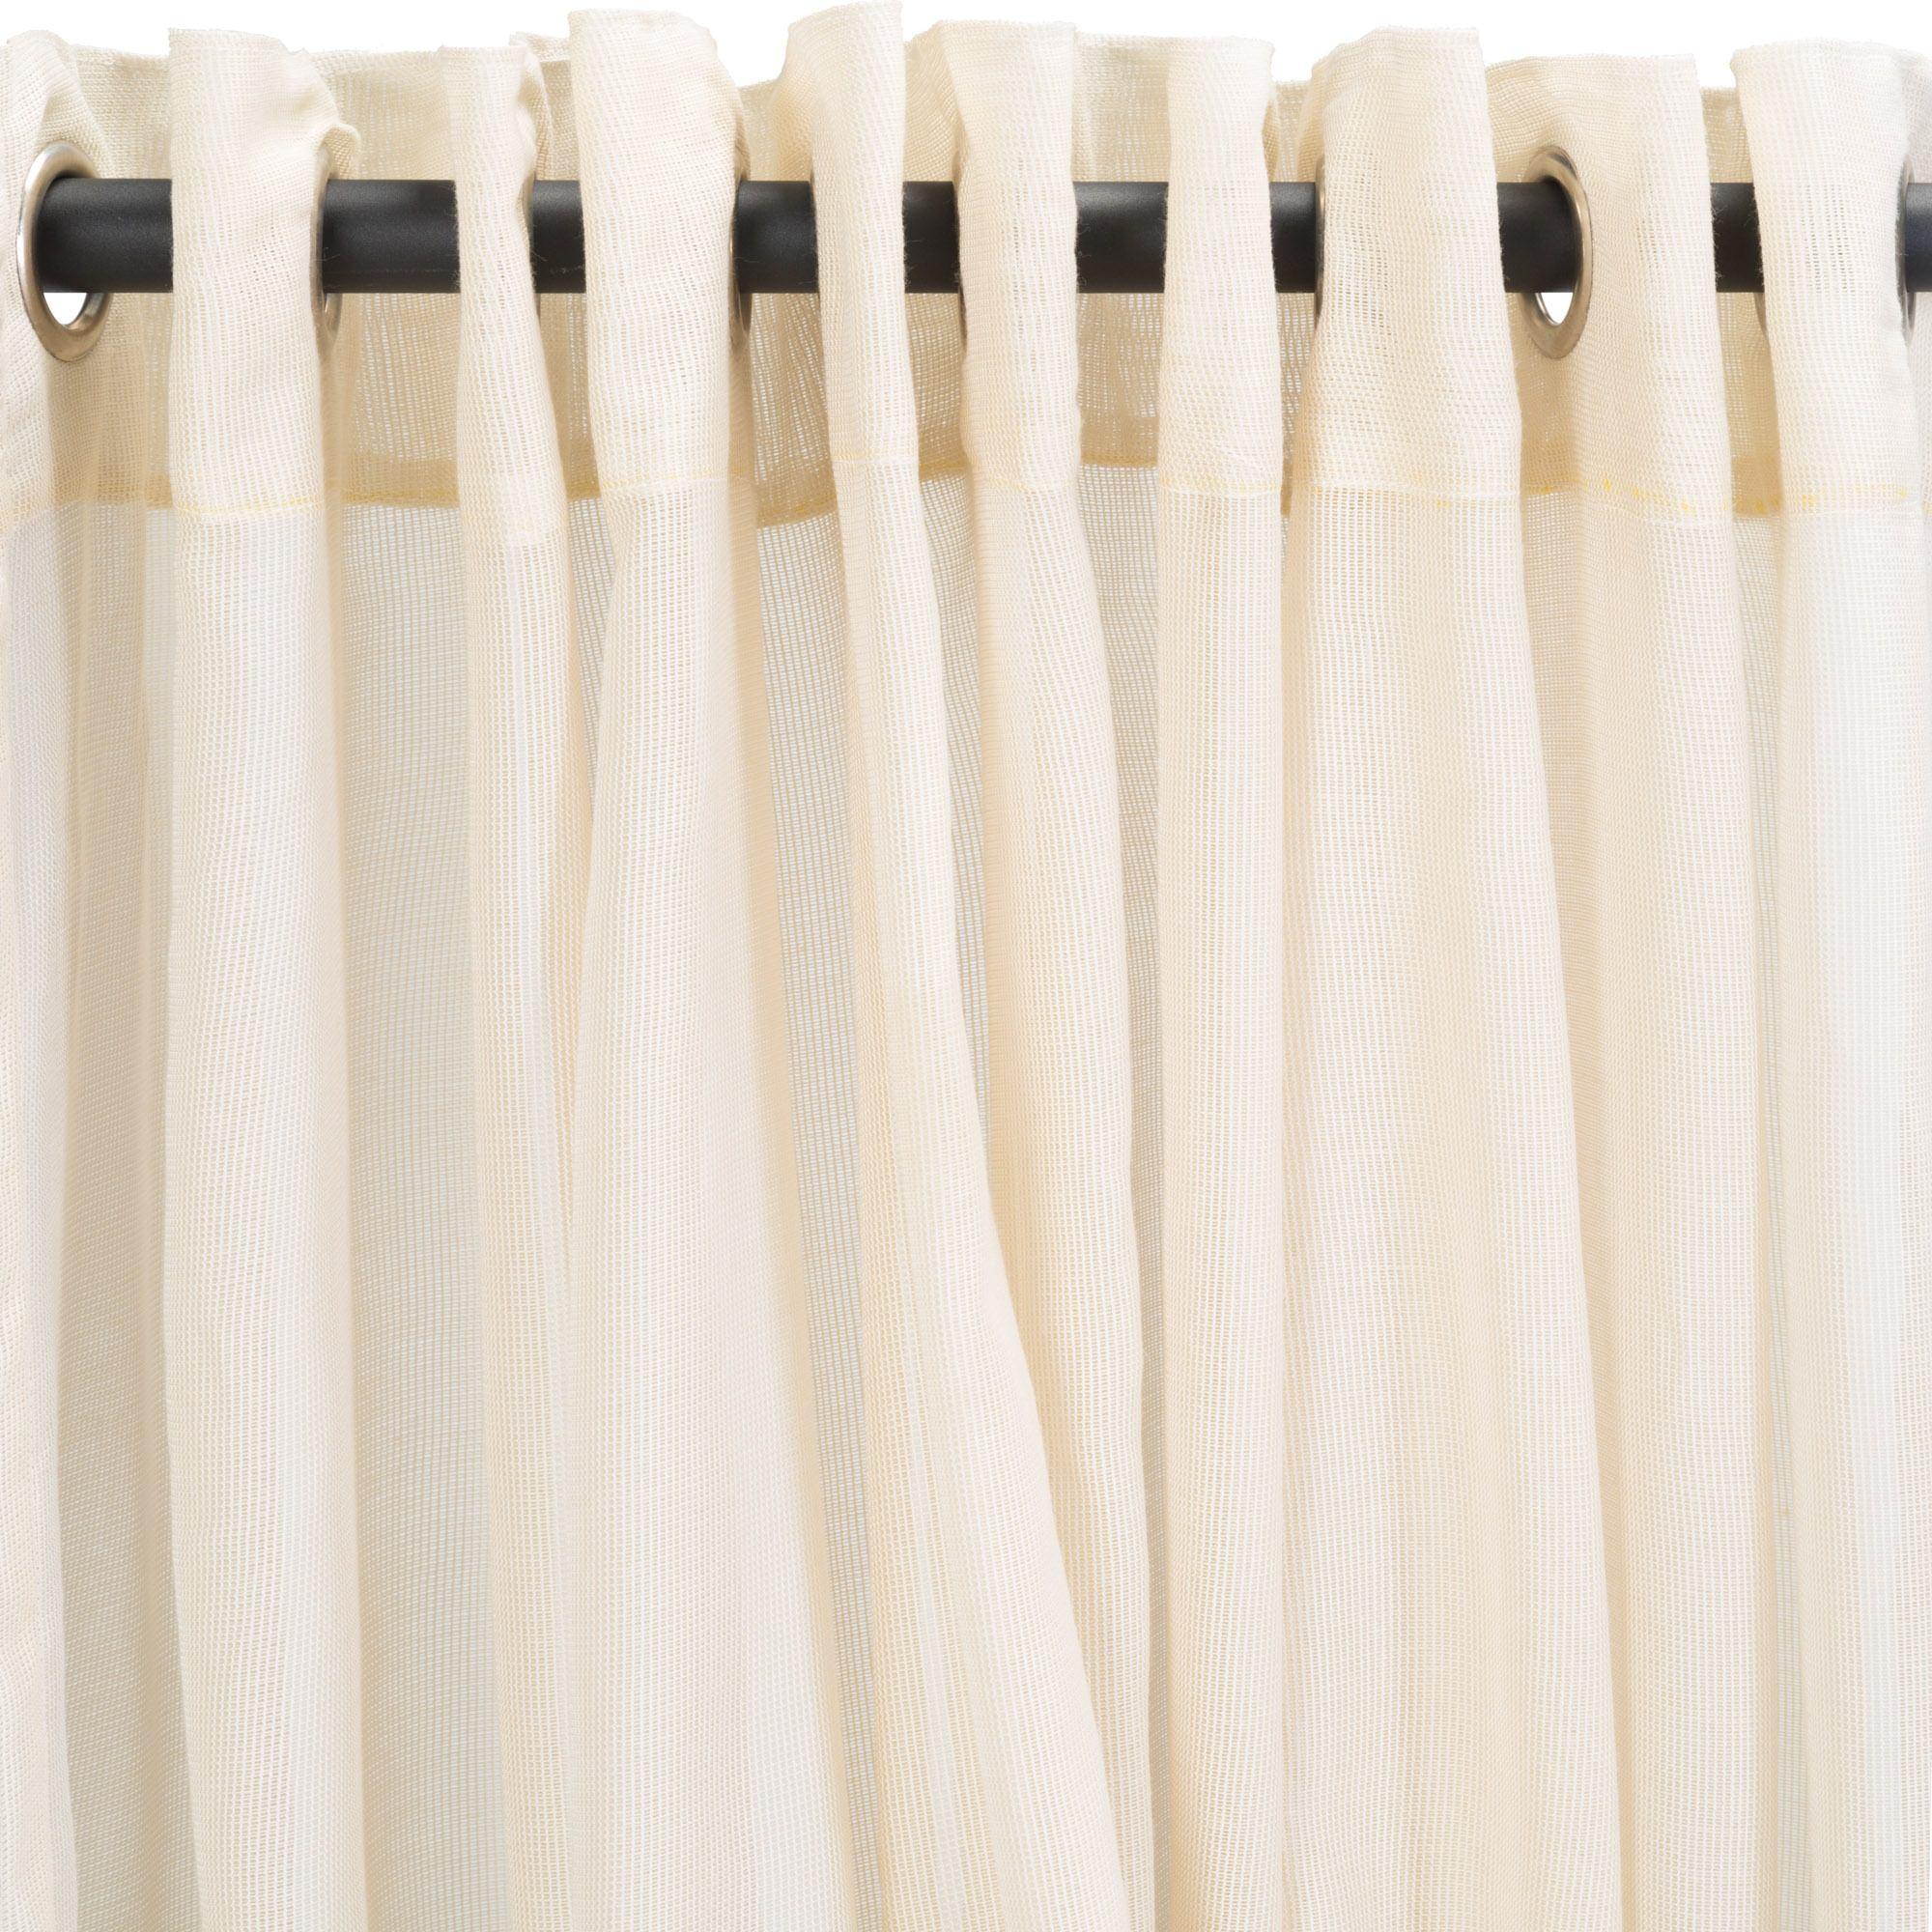 Sheer Beige Extra Wide Outdoor Curtain